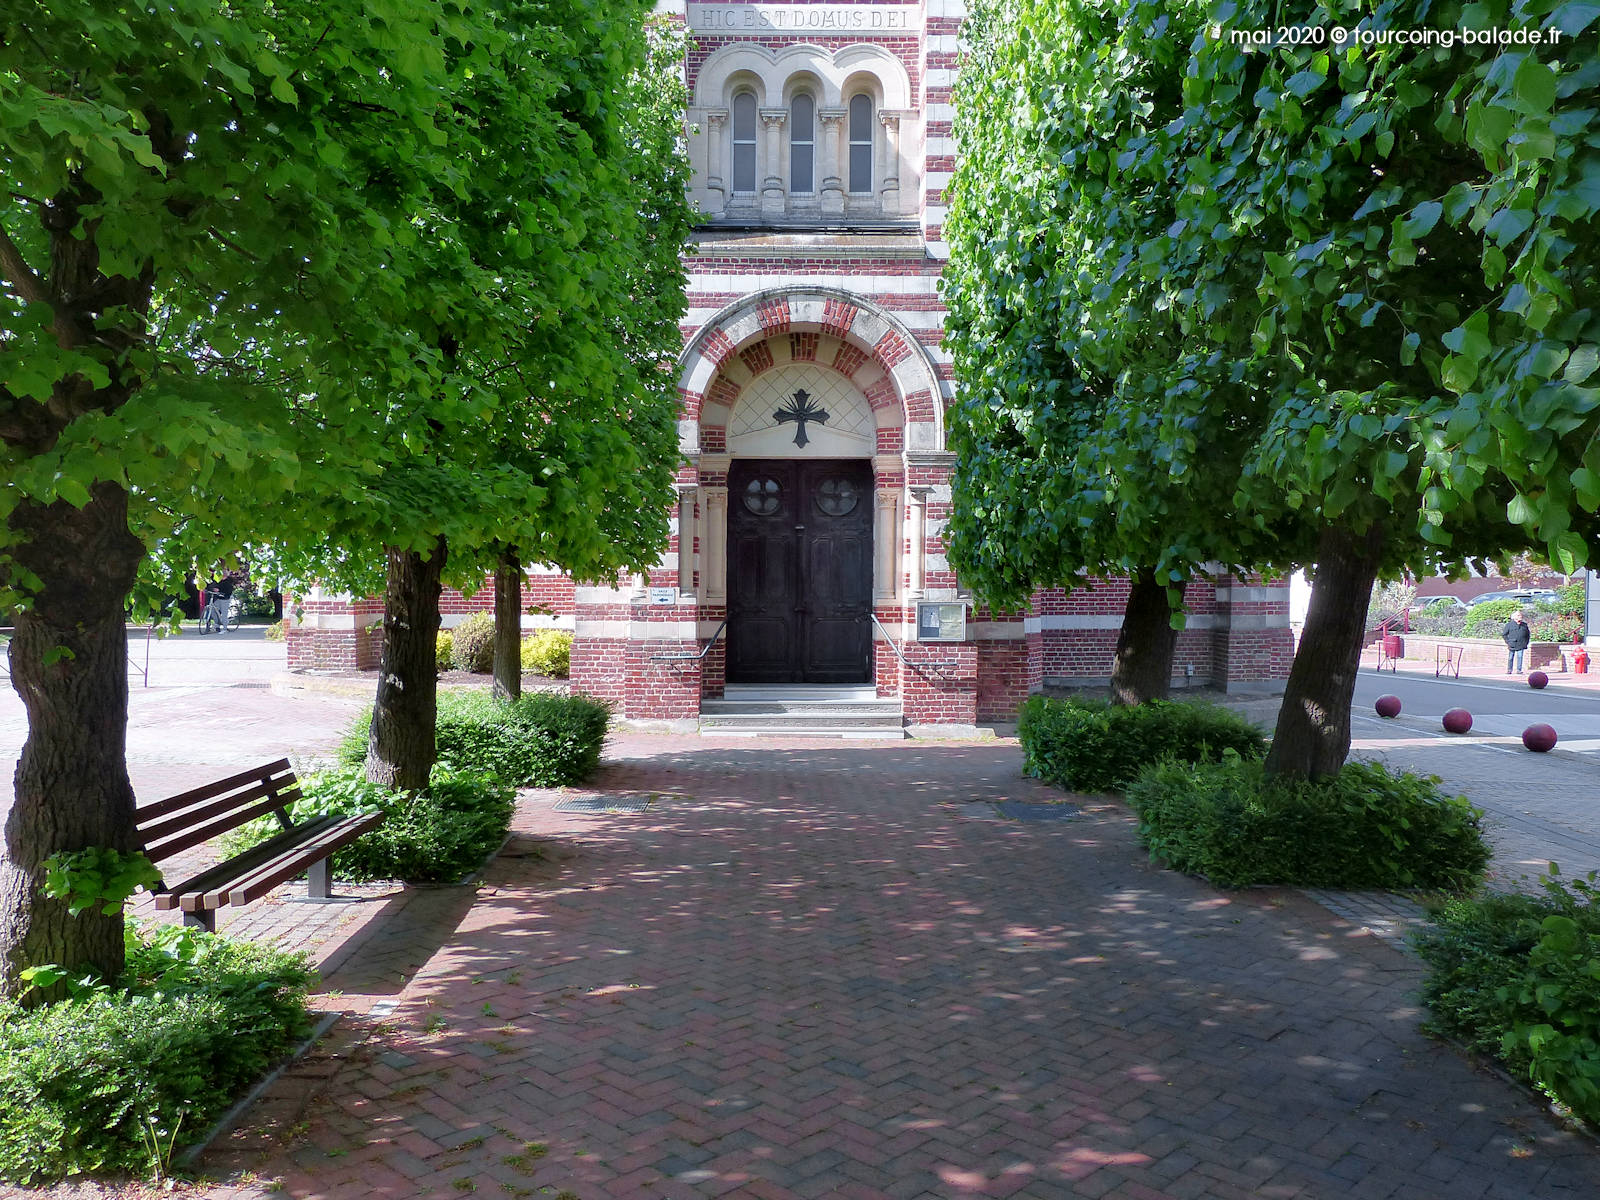 Portail Église Saint Martin, Templemars 2020